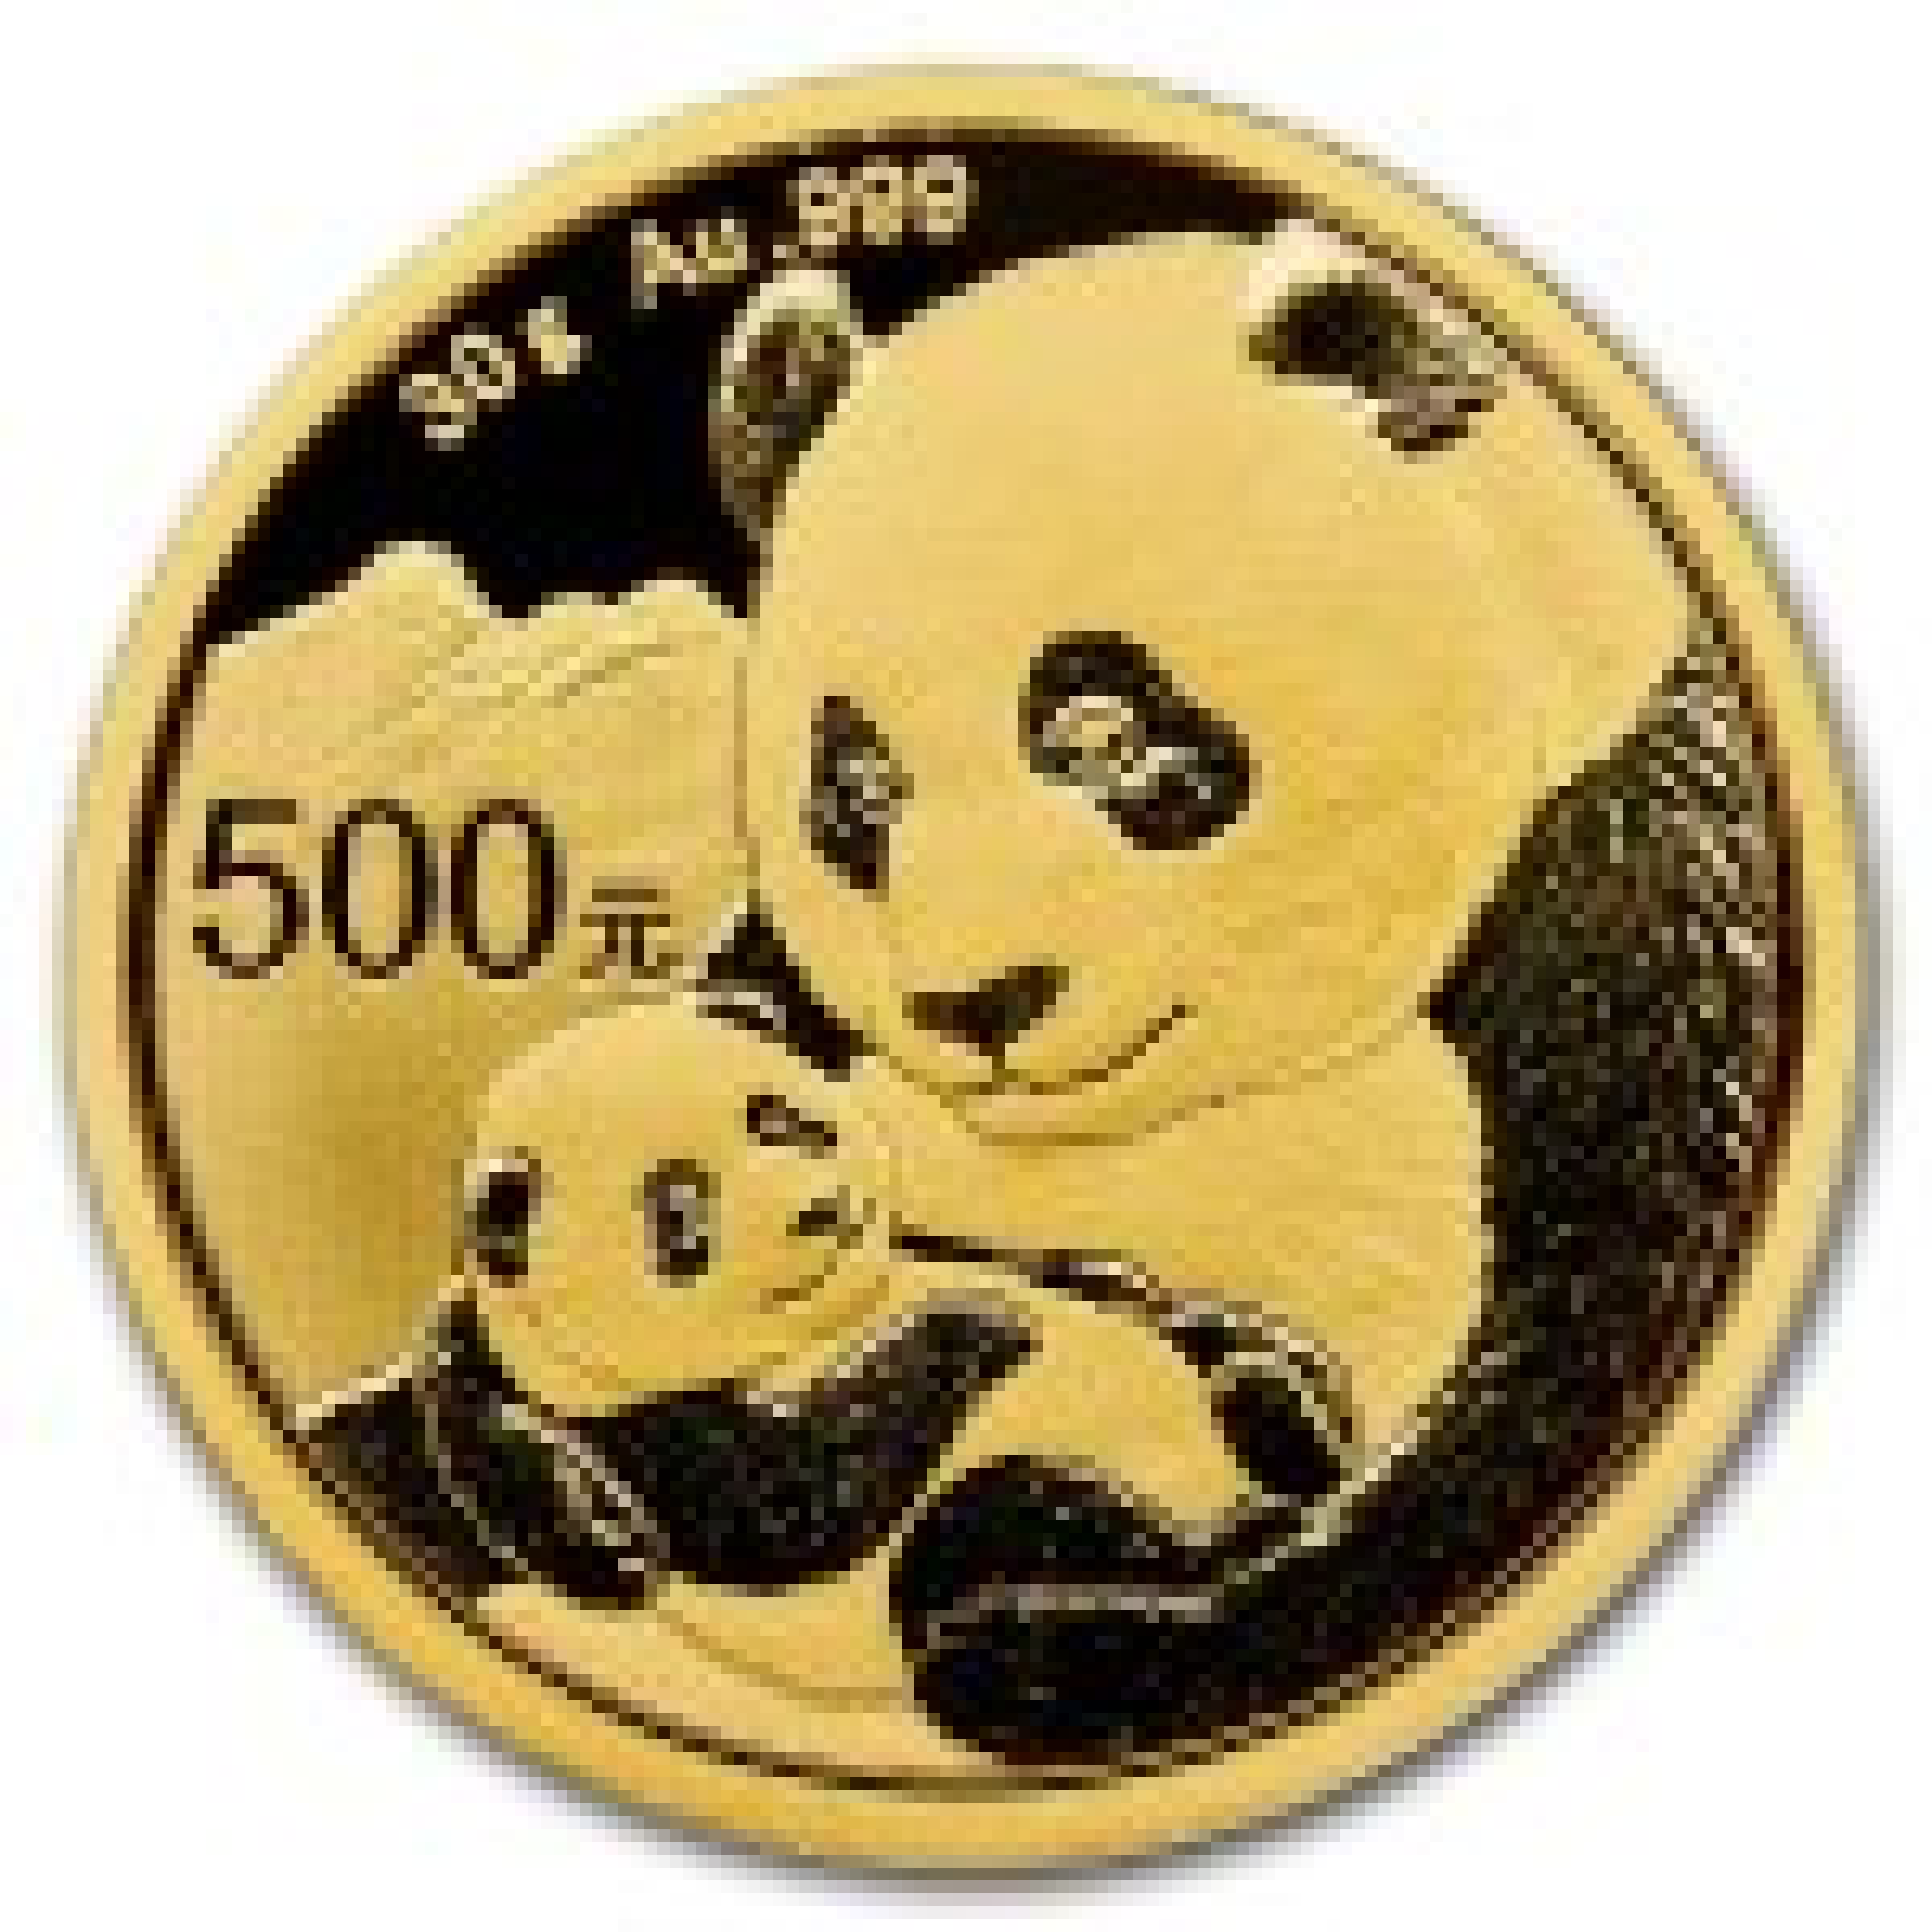 30 Gram gouden munt Panda 2019